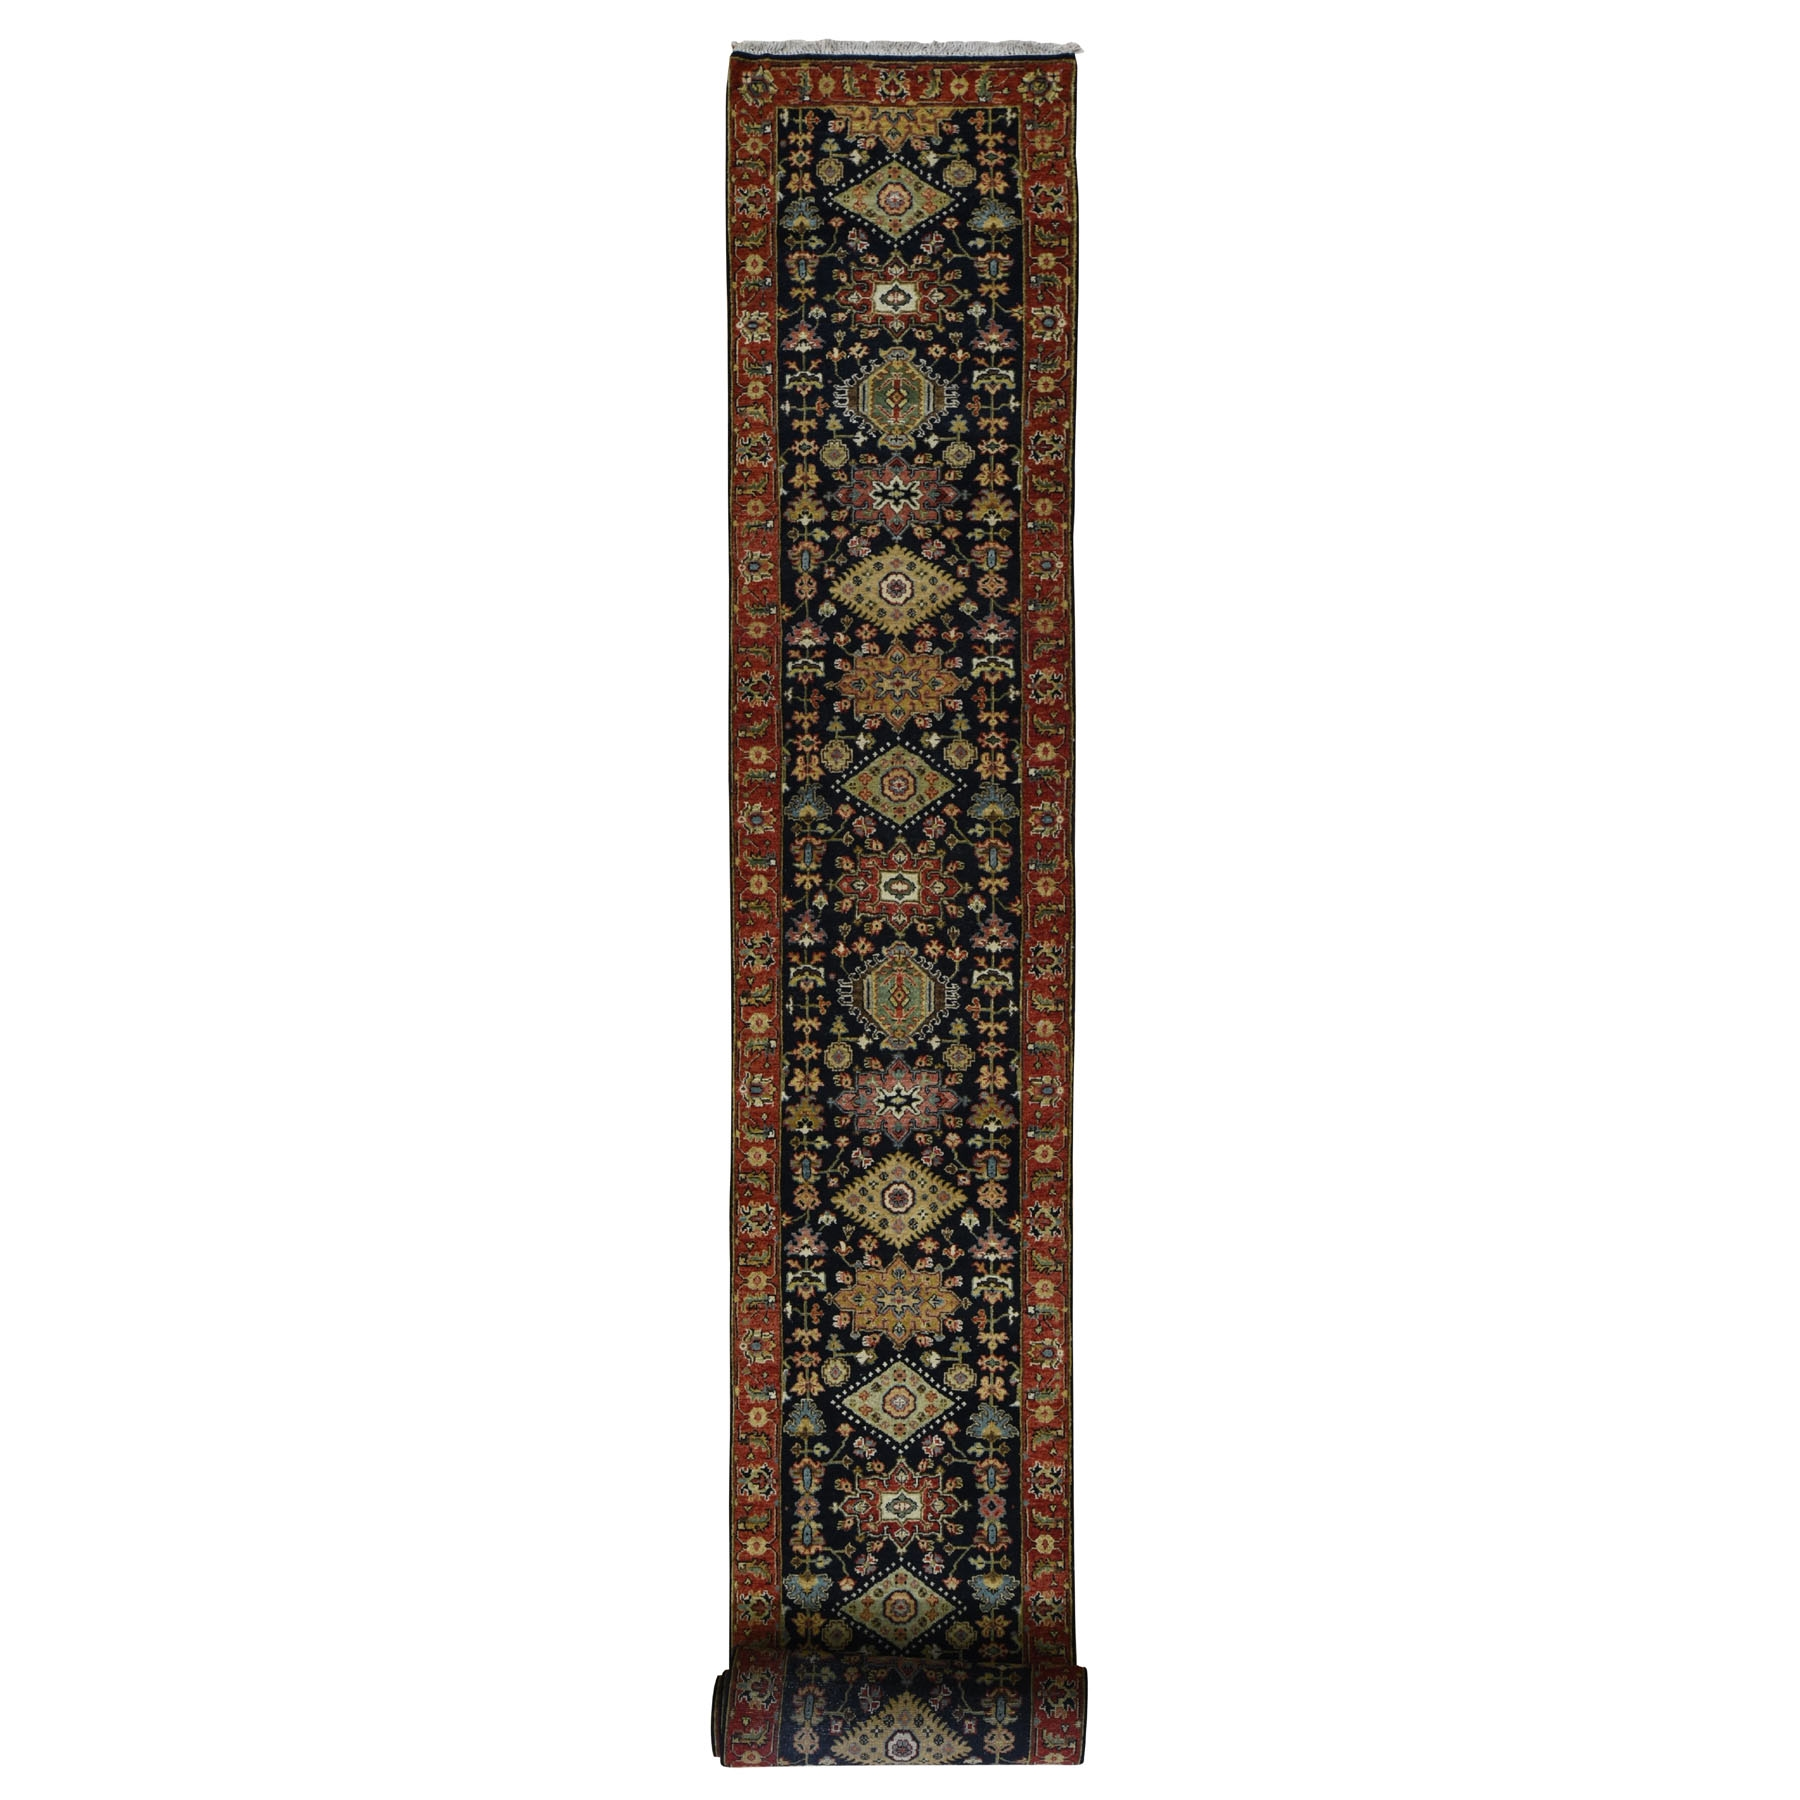 Serapi Heriz and Bakhshayesh Collection Hand Knotted Black Rug No: 197954